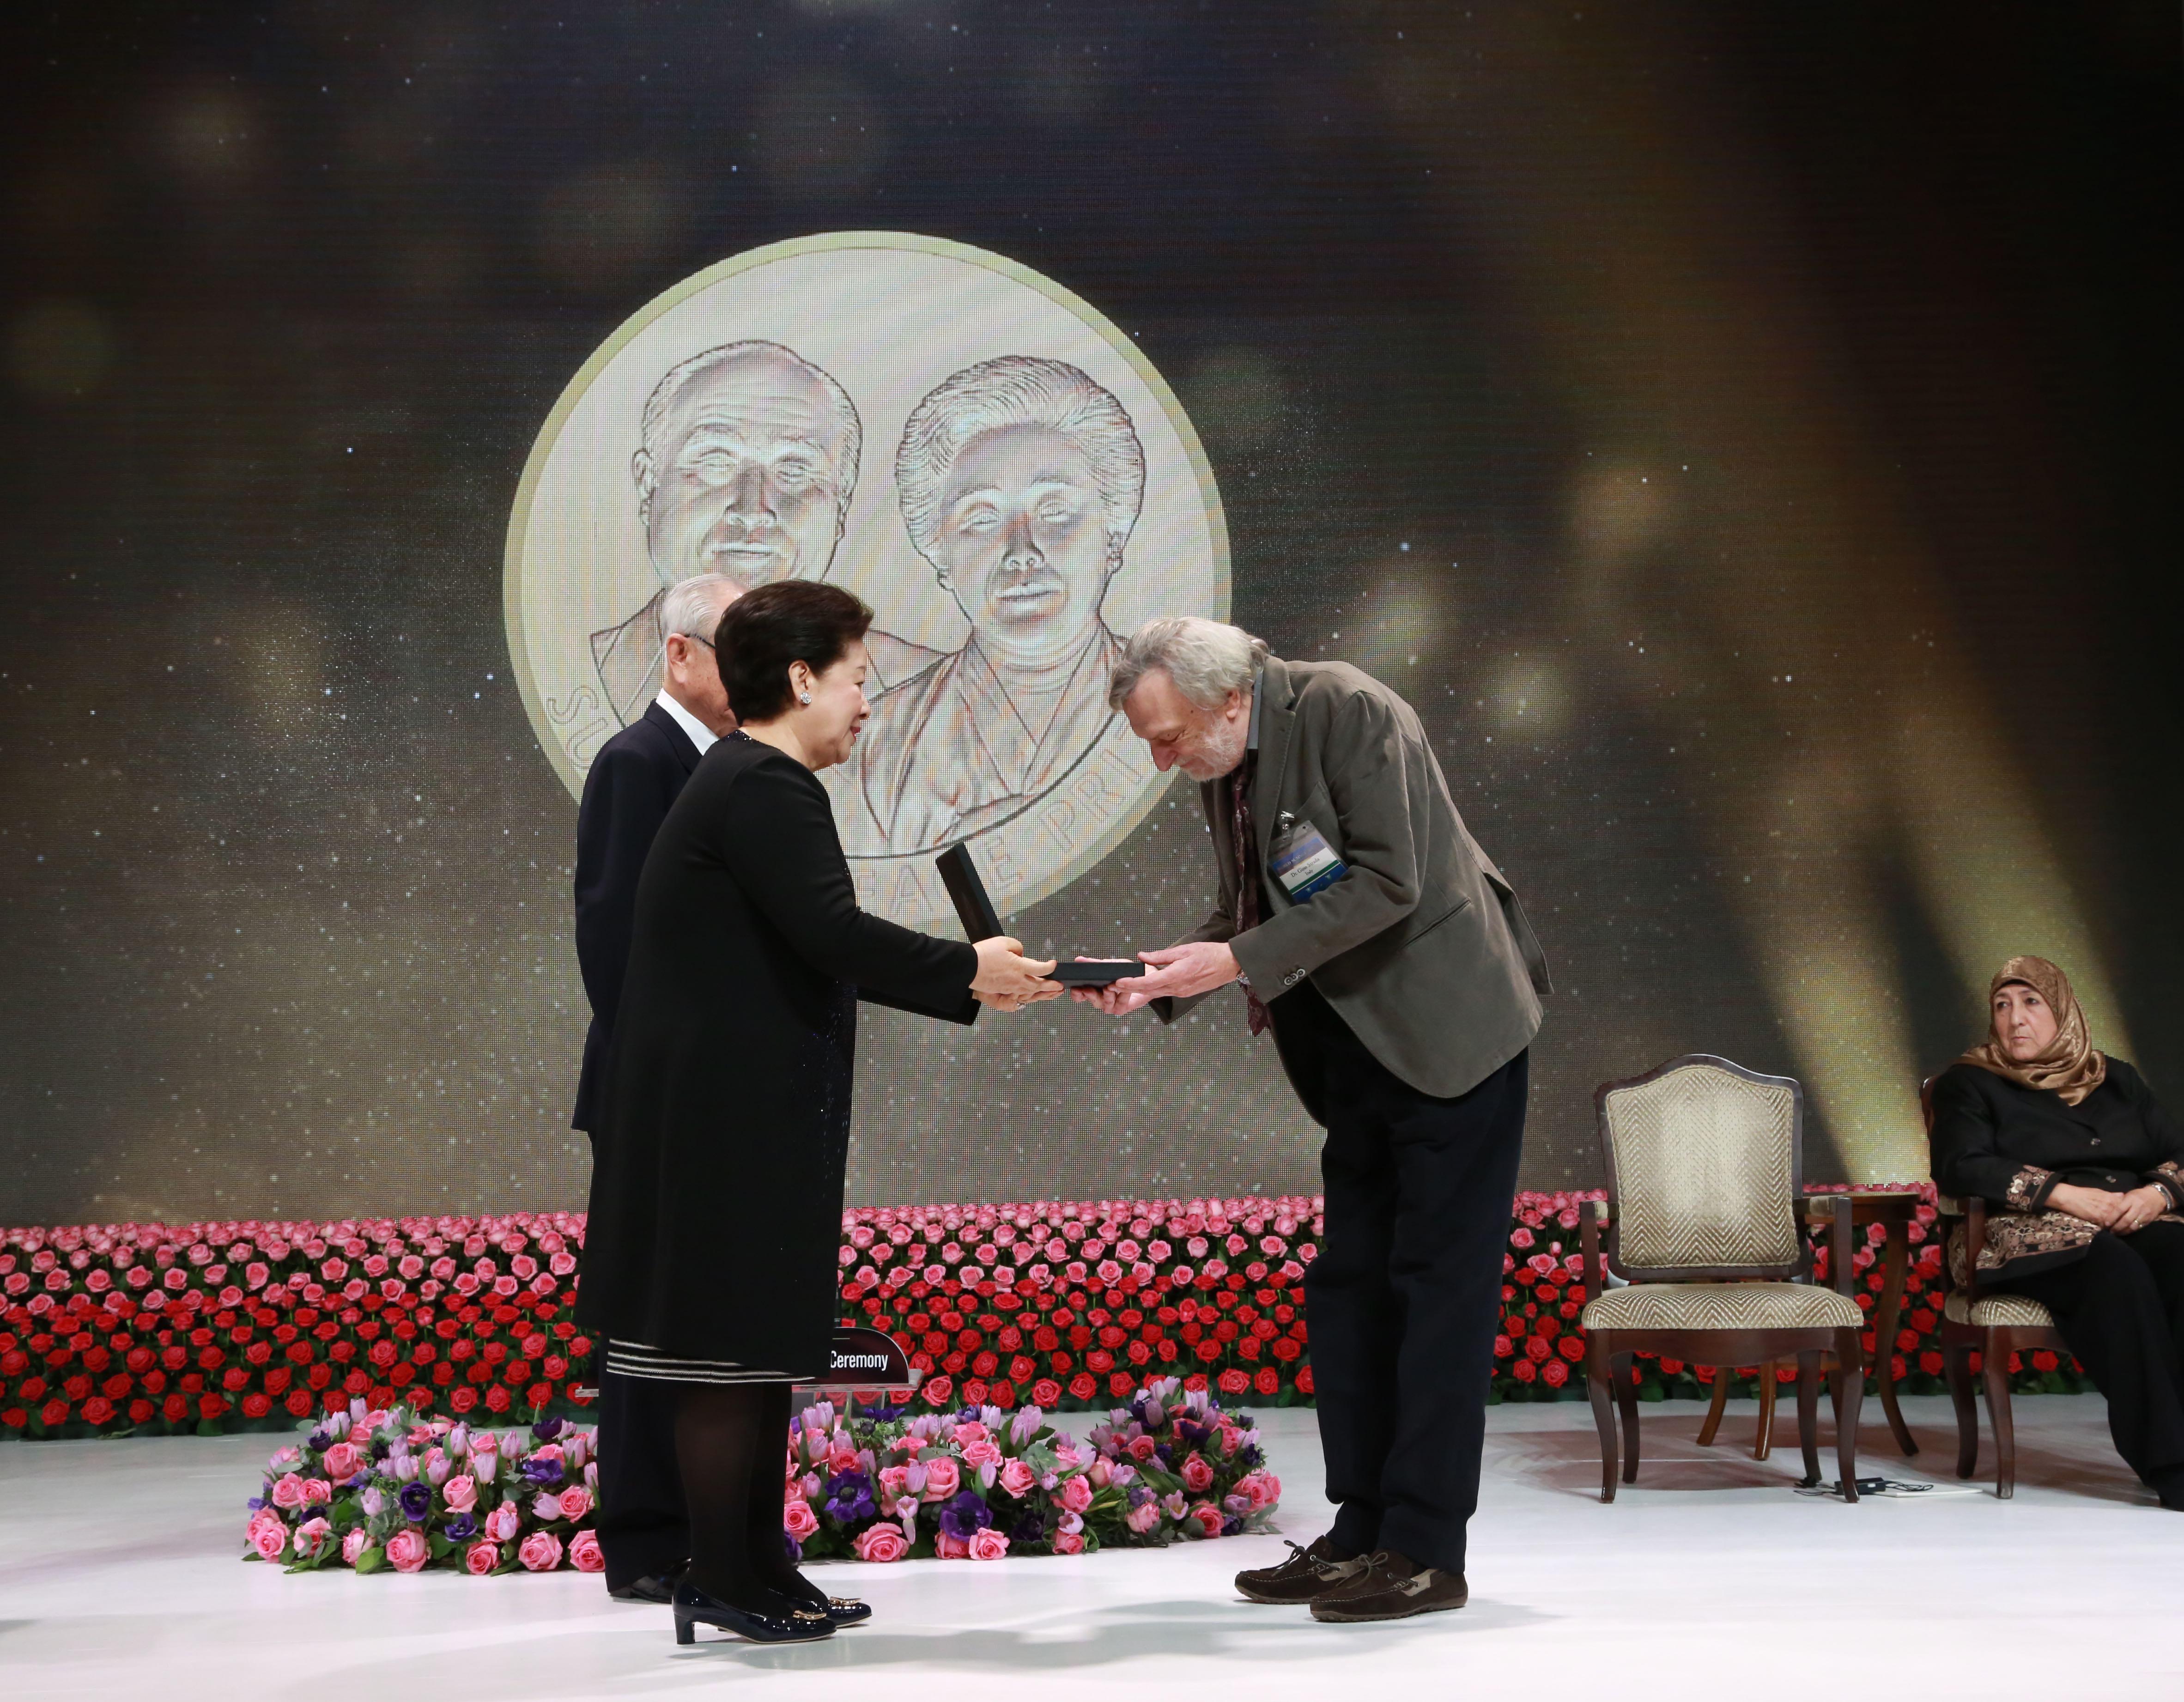 EMERGENCY Founder Gino Strada Receives 2017 Sunhak Peace Prize